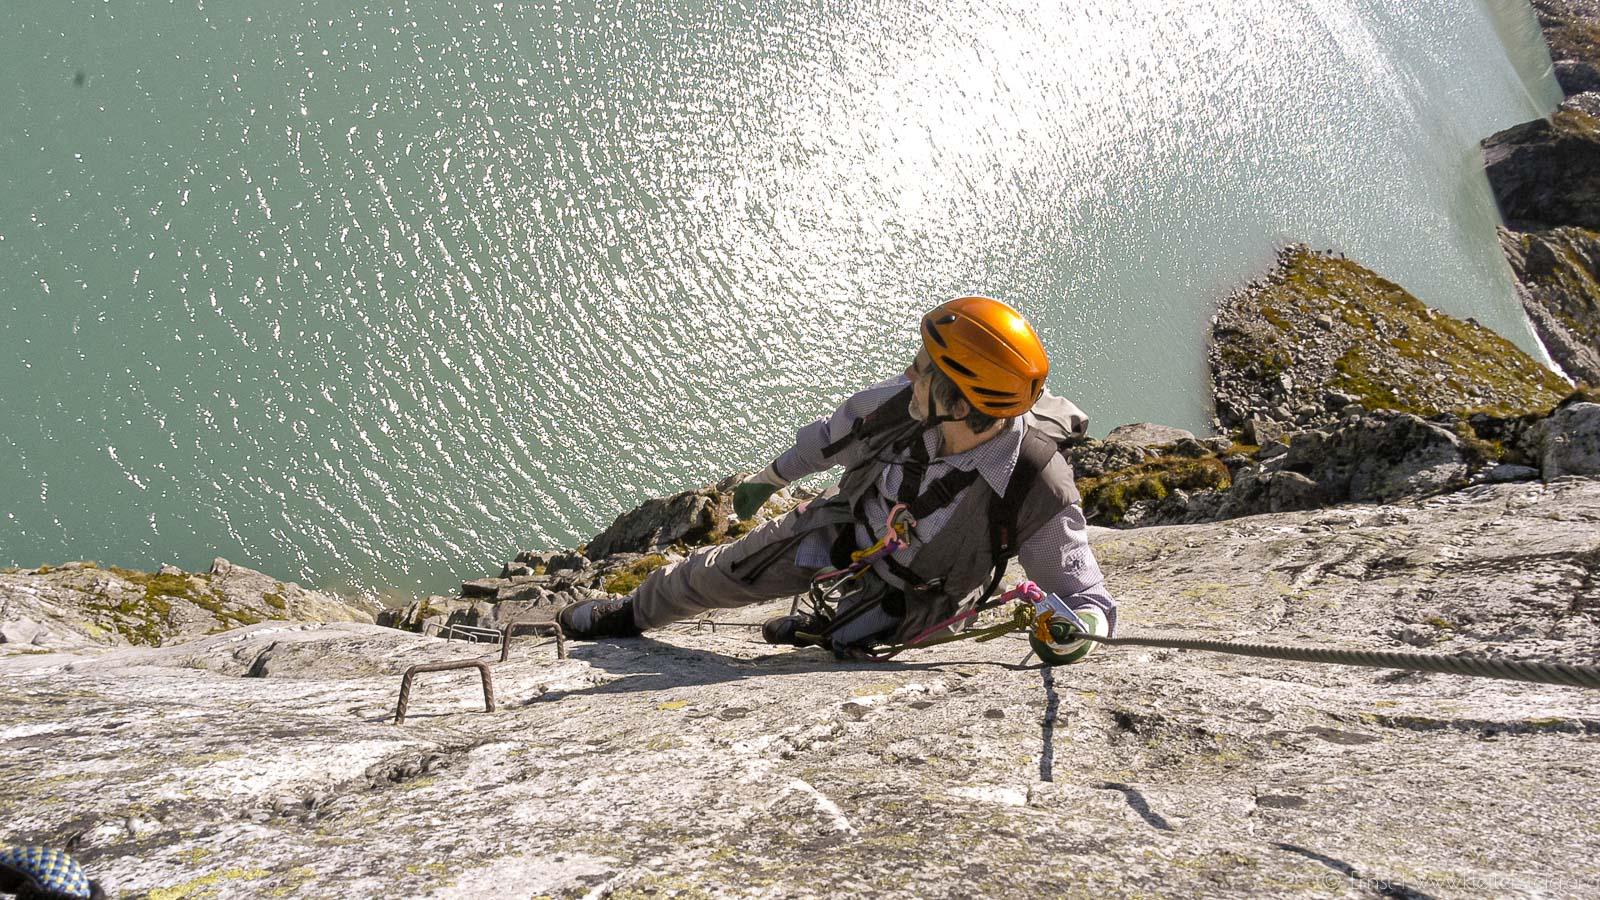 Kristall-Klettersteig | Bildervideo